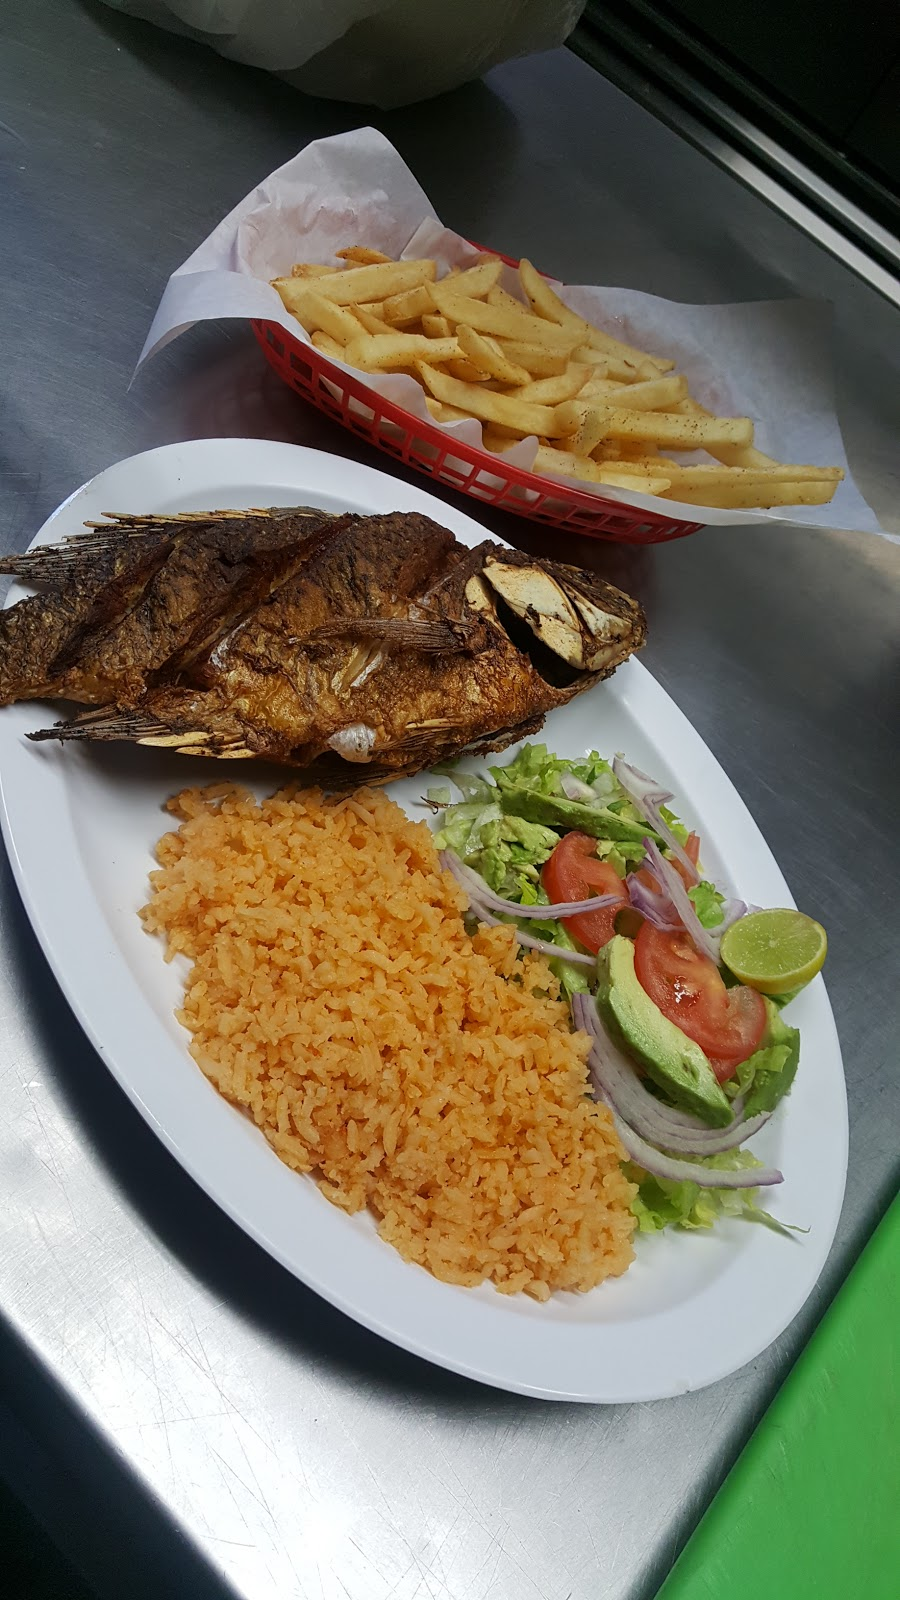 Balbuenas Mexican Restaurant - restaurant    Photo 2 of 10   Address: 10925 1/2 S. Figueroa, Los Angeles, CA 90061, USA   Phone: (323) 418-8502